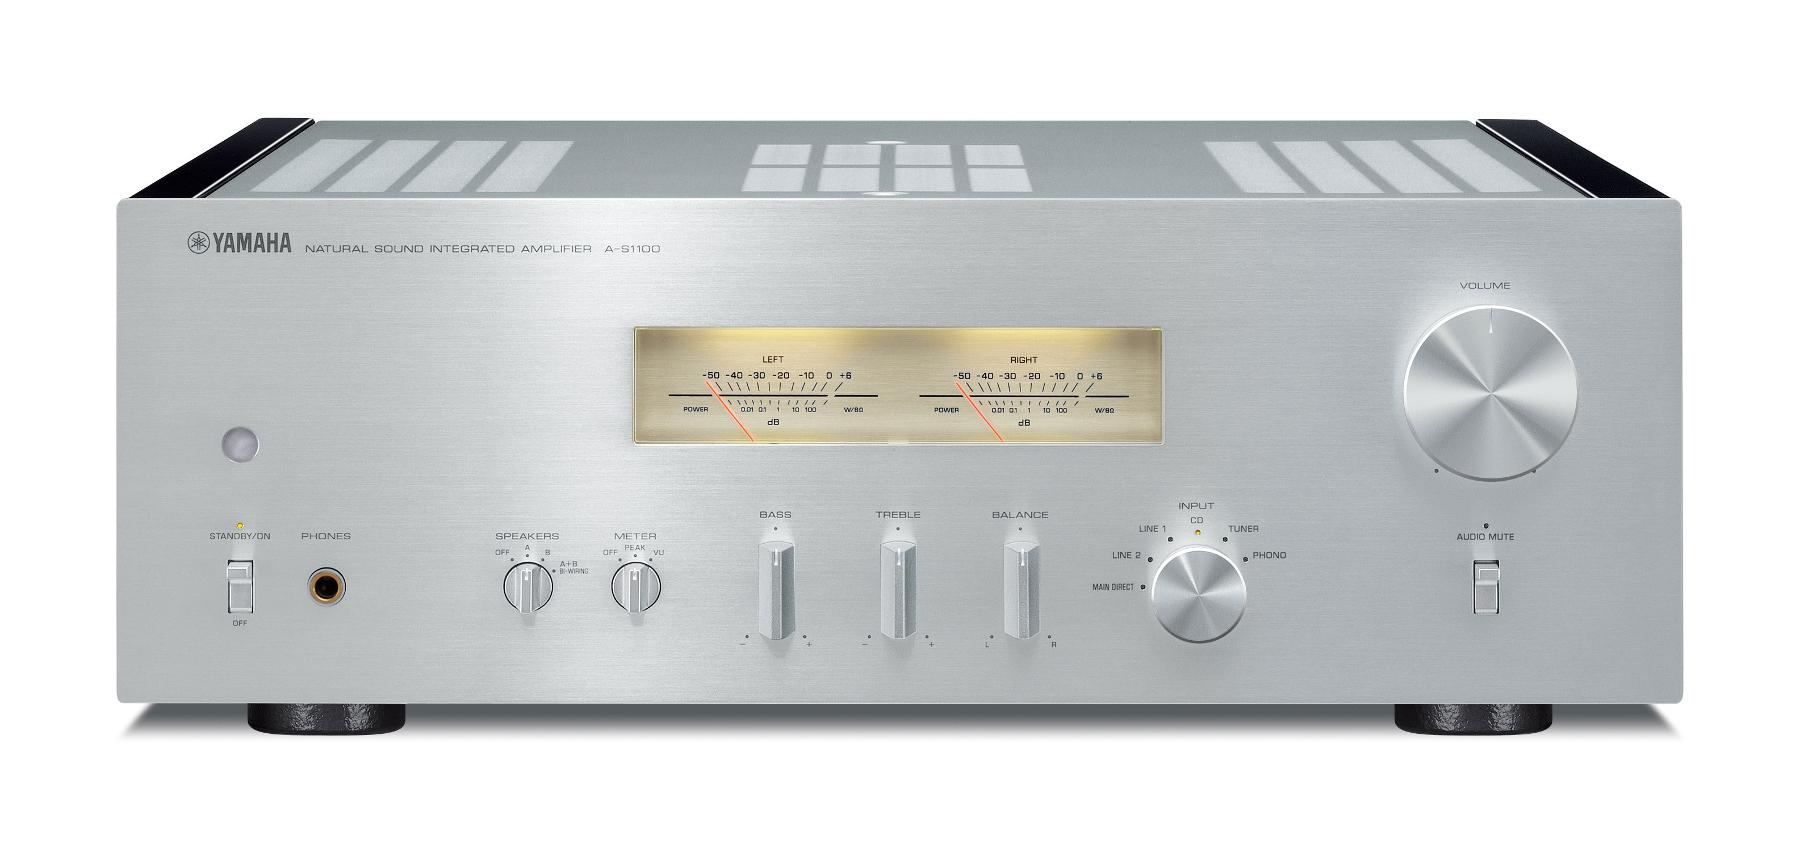 Yamaha A-S1100 Stereo Receiver, Discrete Phono Amp | Full